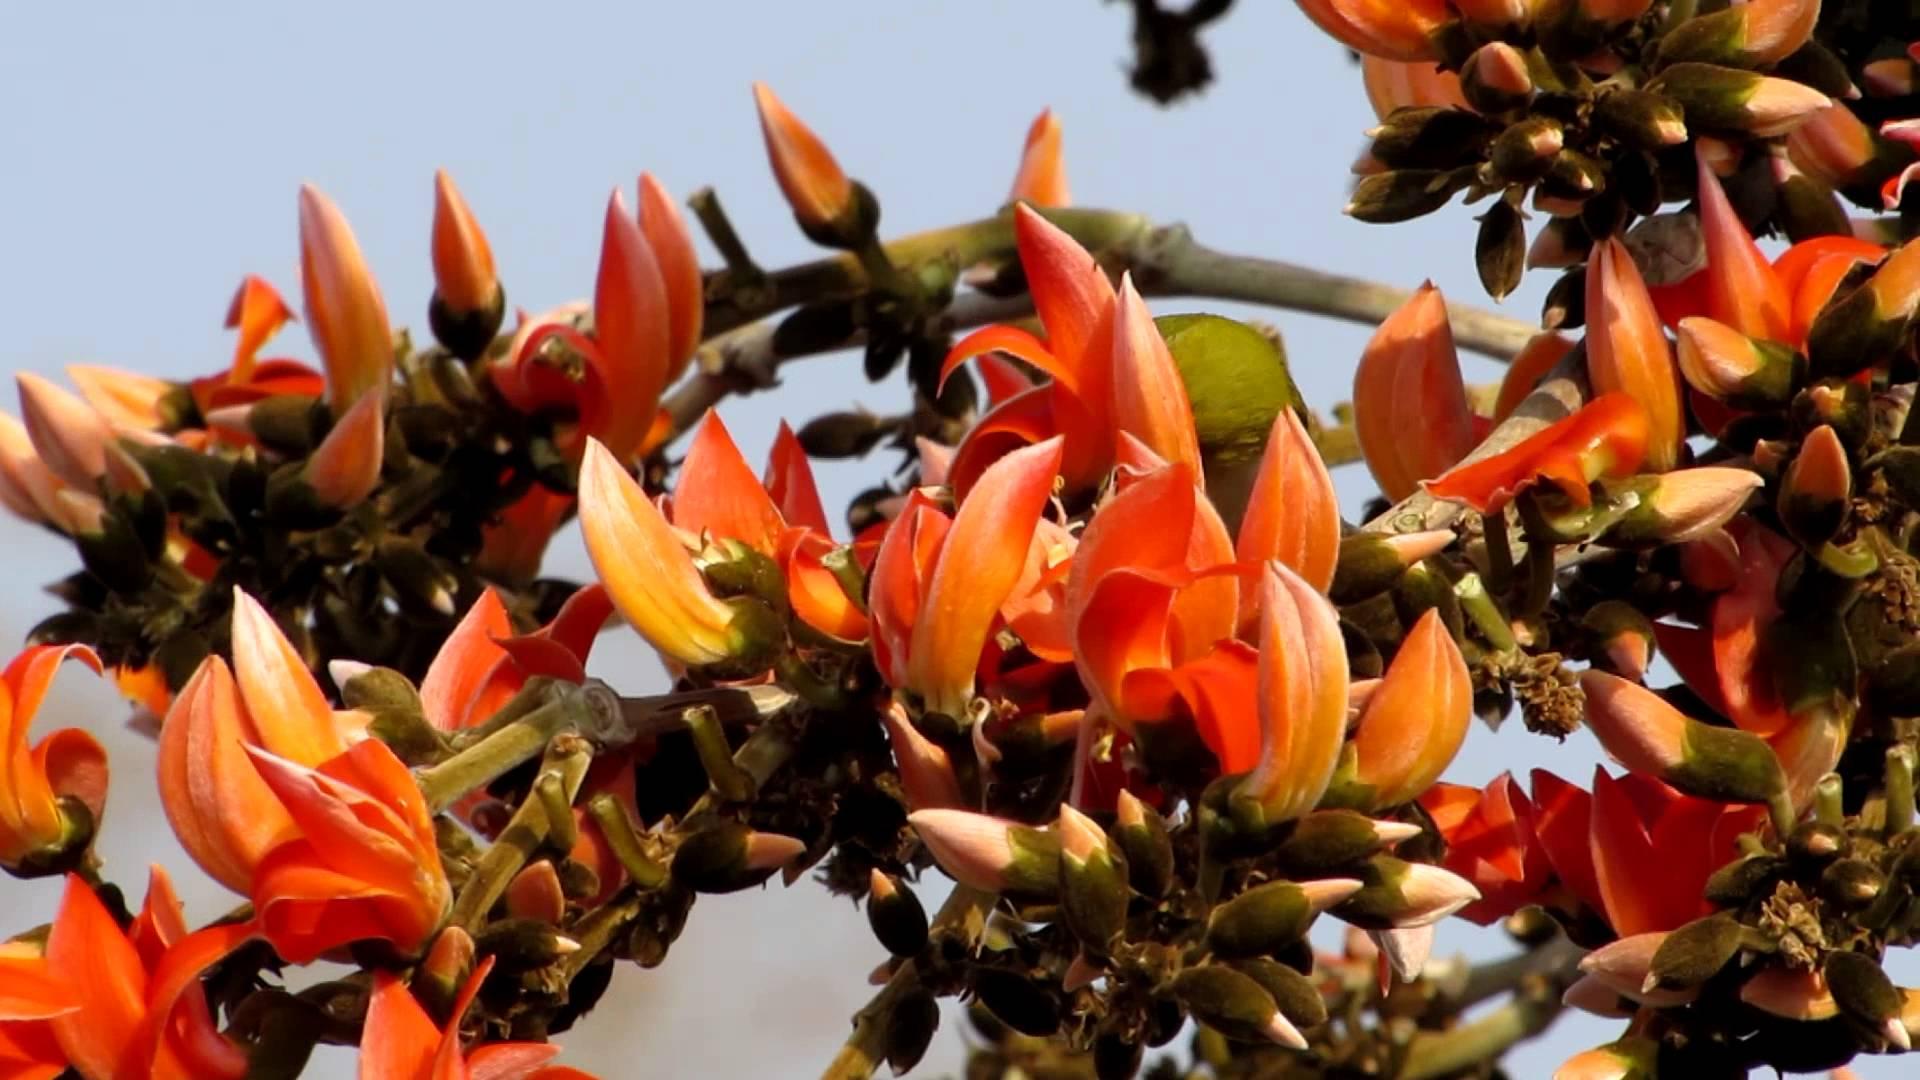 Flower names in hindi and english list of flowers palash palaash dhaak butea monosperma izmirmasajfo